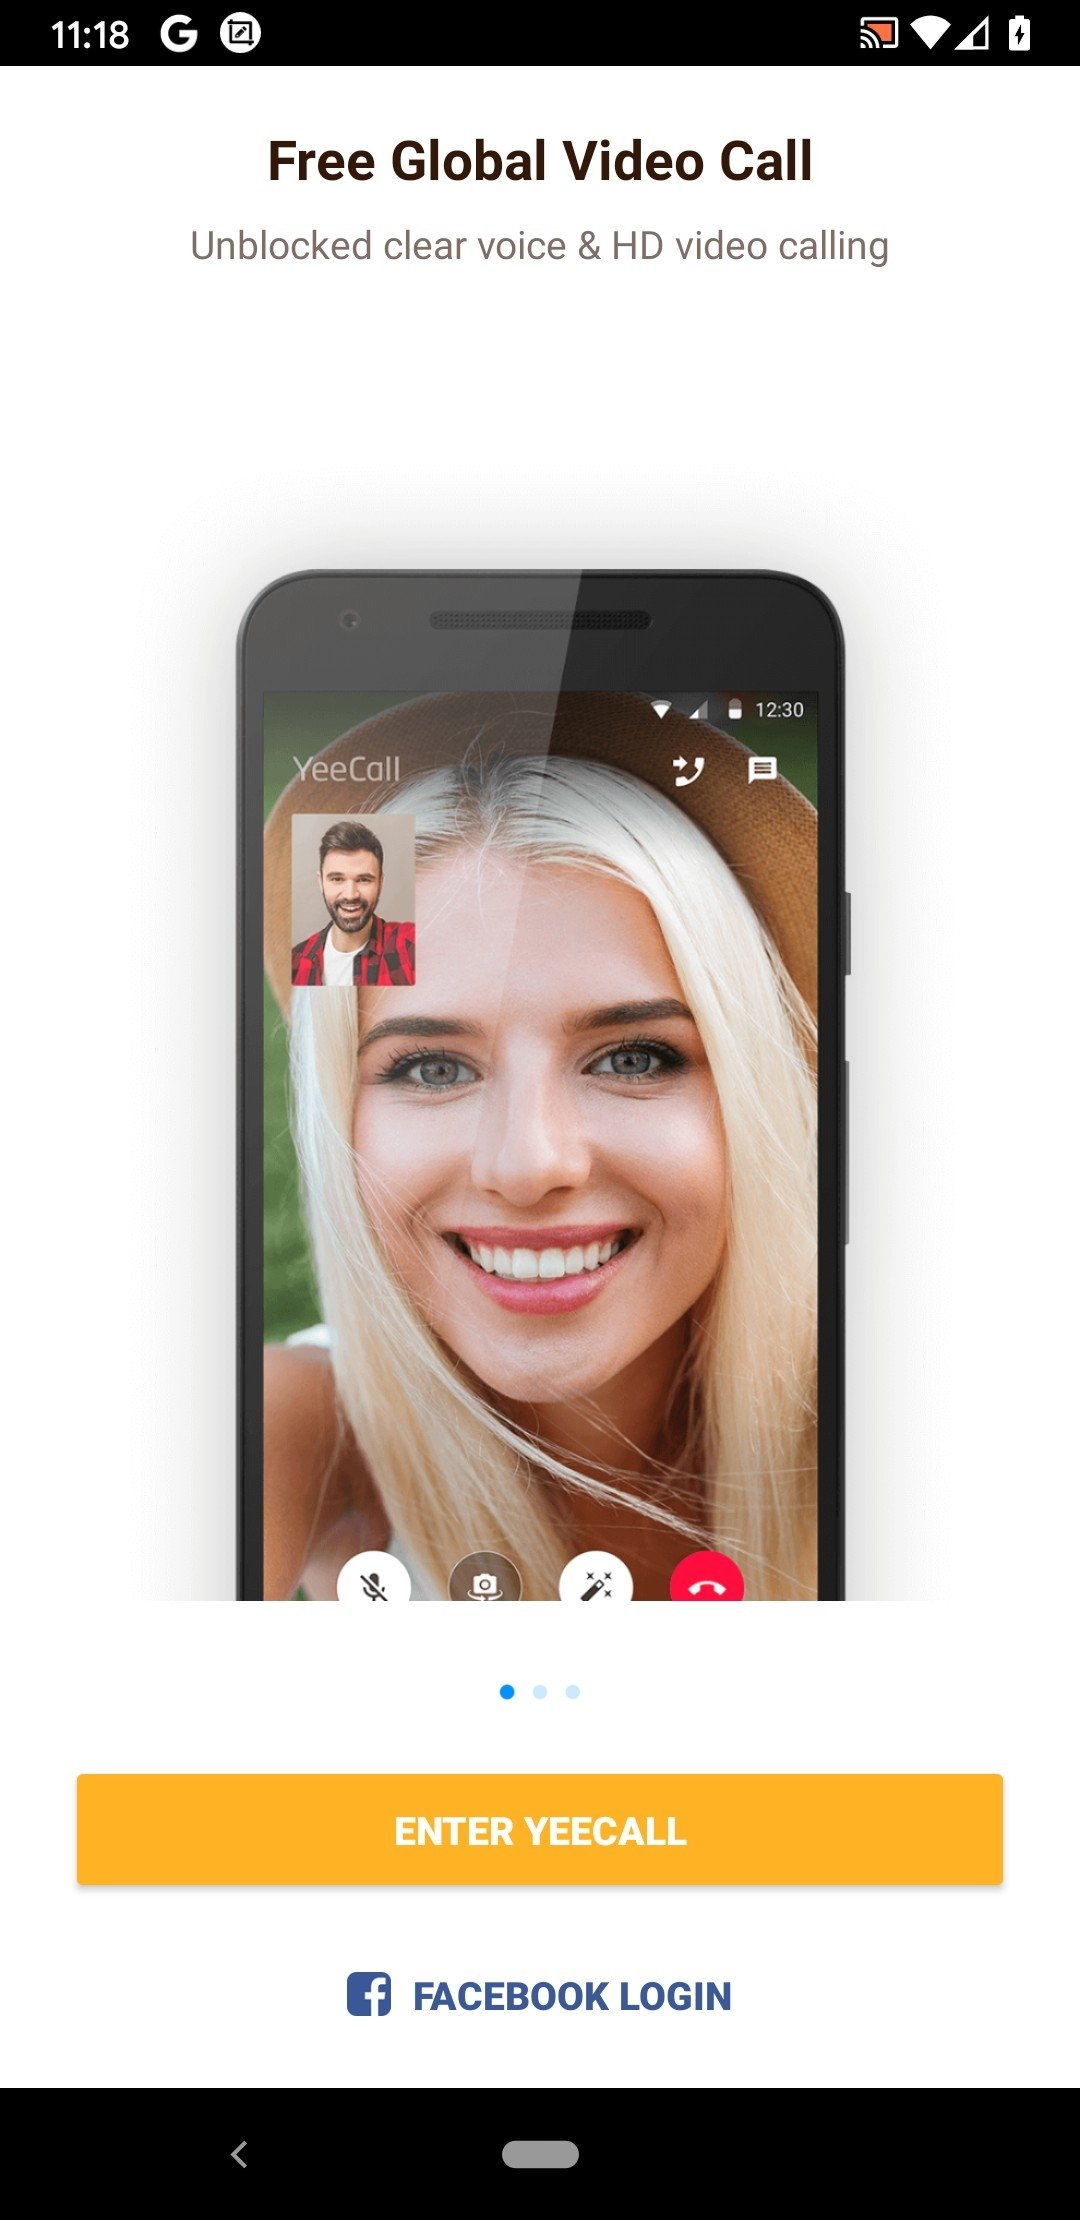 YeeCall Android image 4